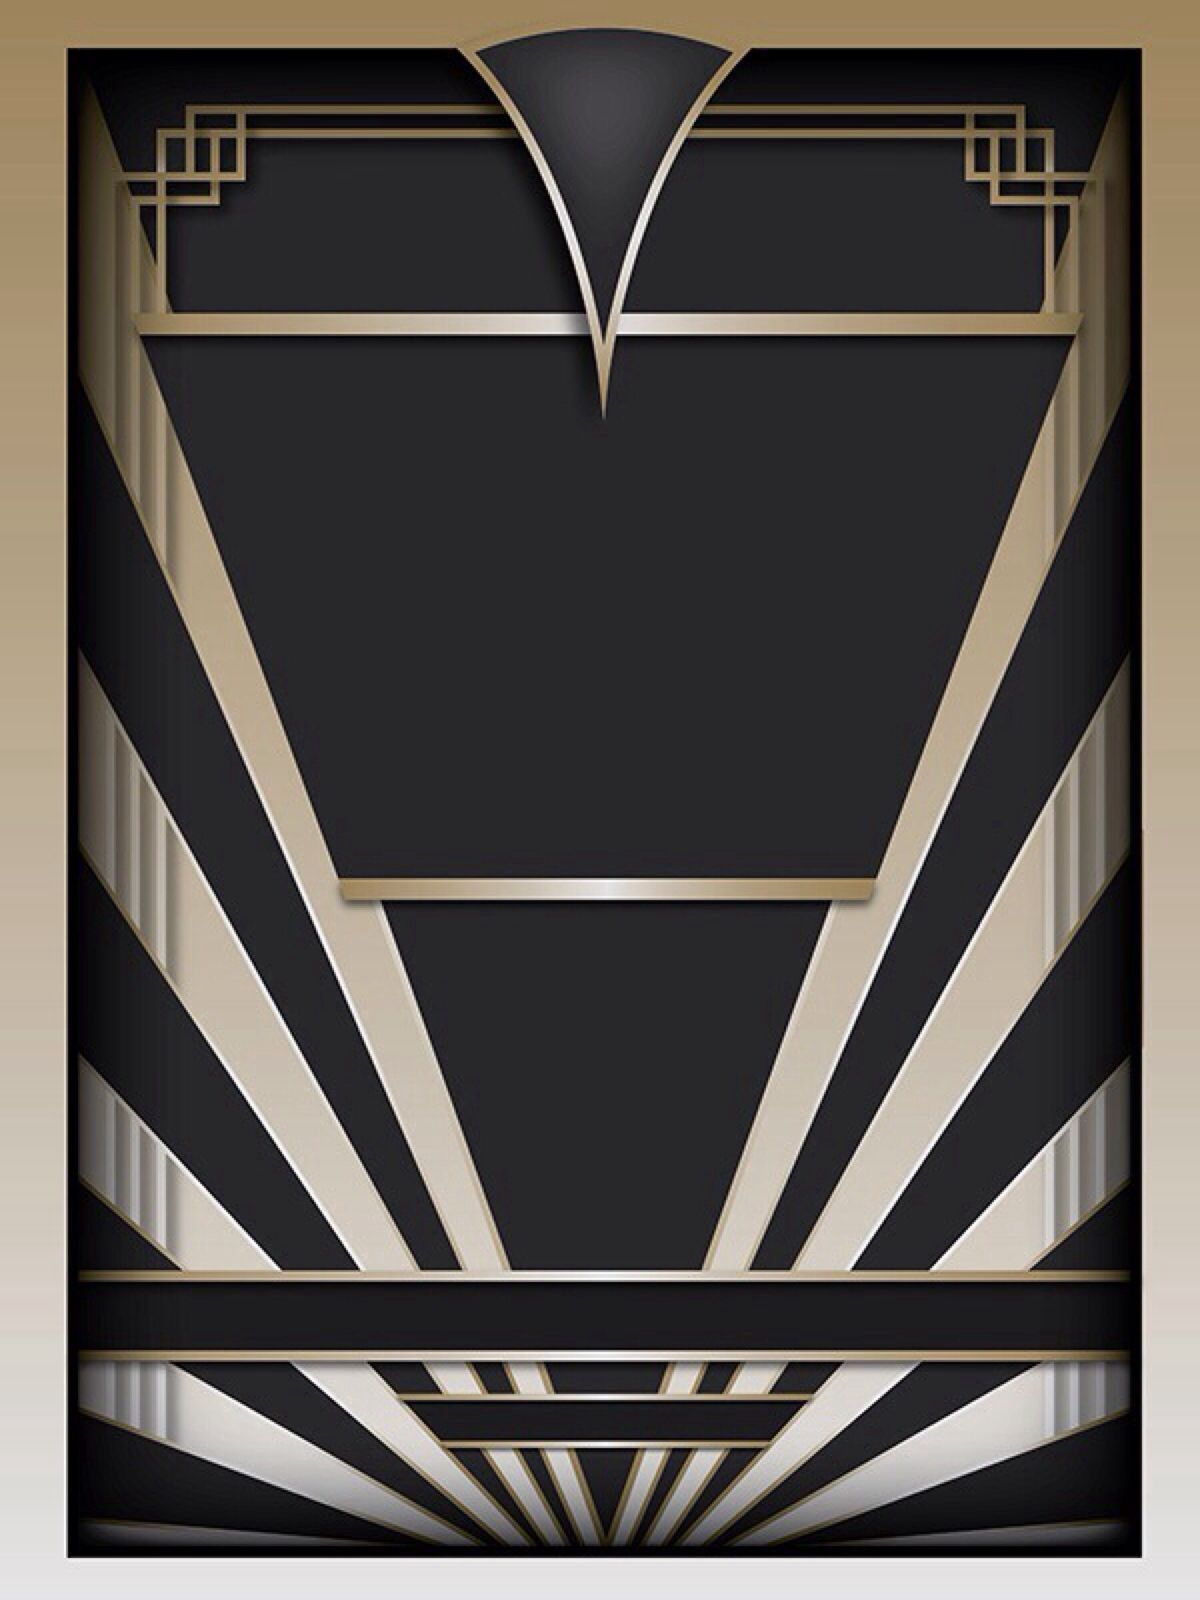 Art Deco Design Public Domain